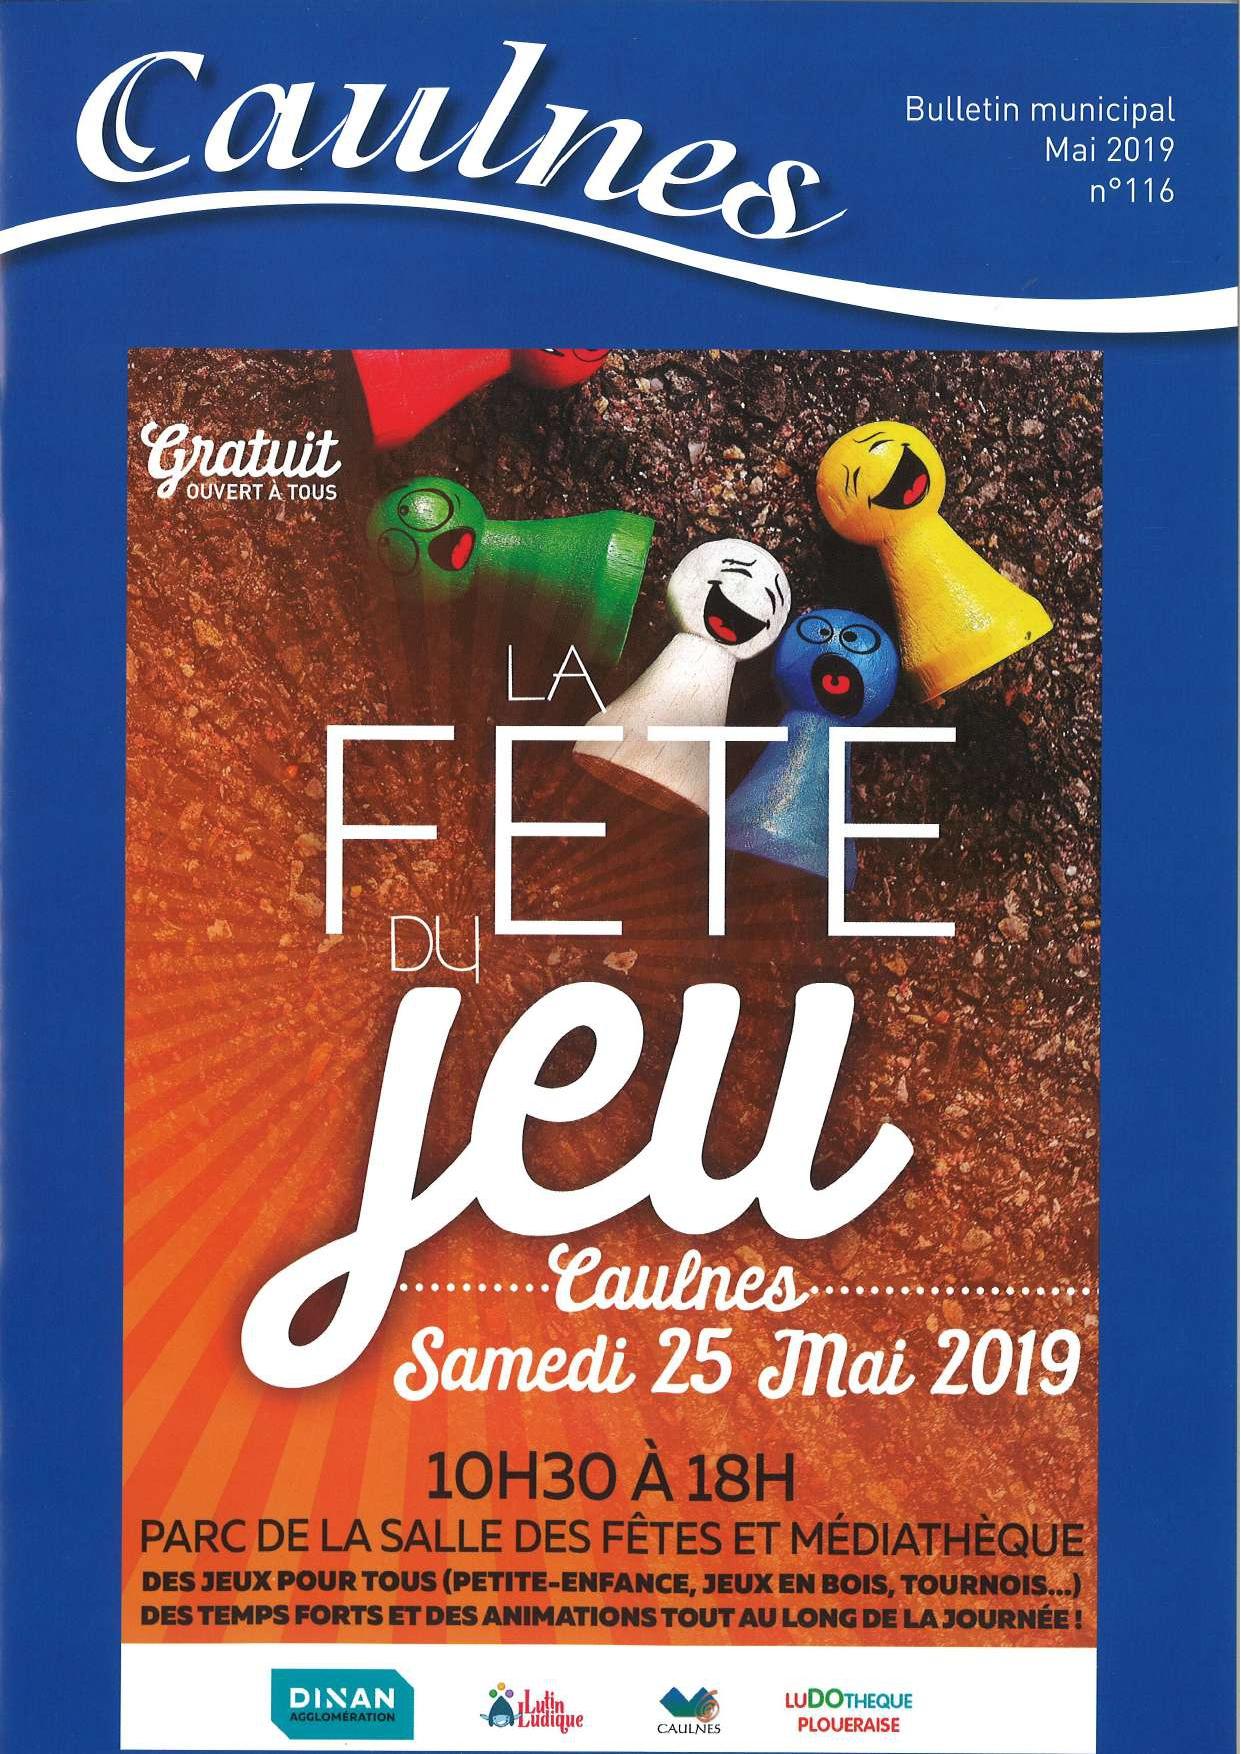 couverture bulletin communal mai 2019